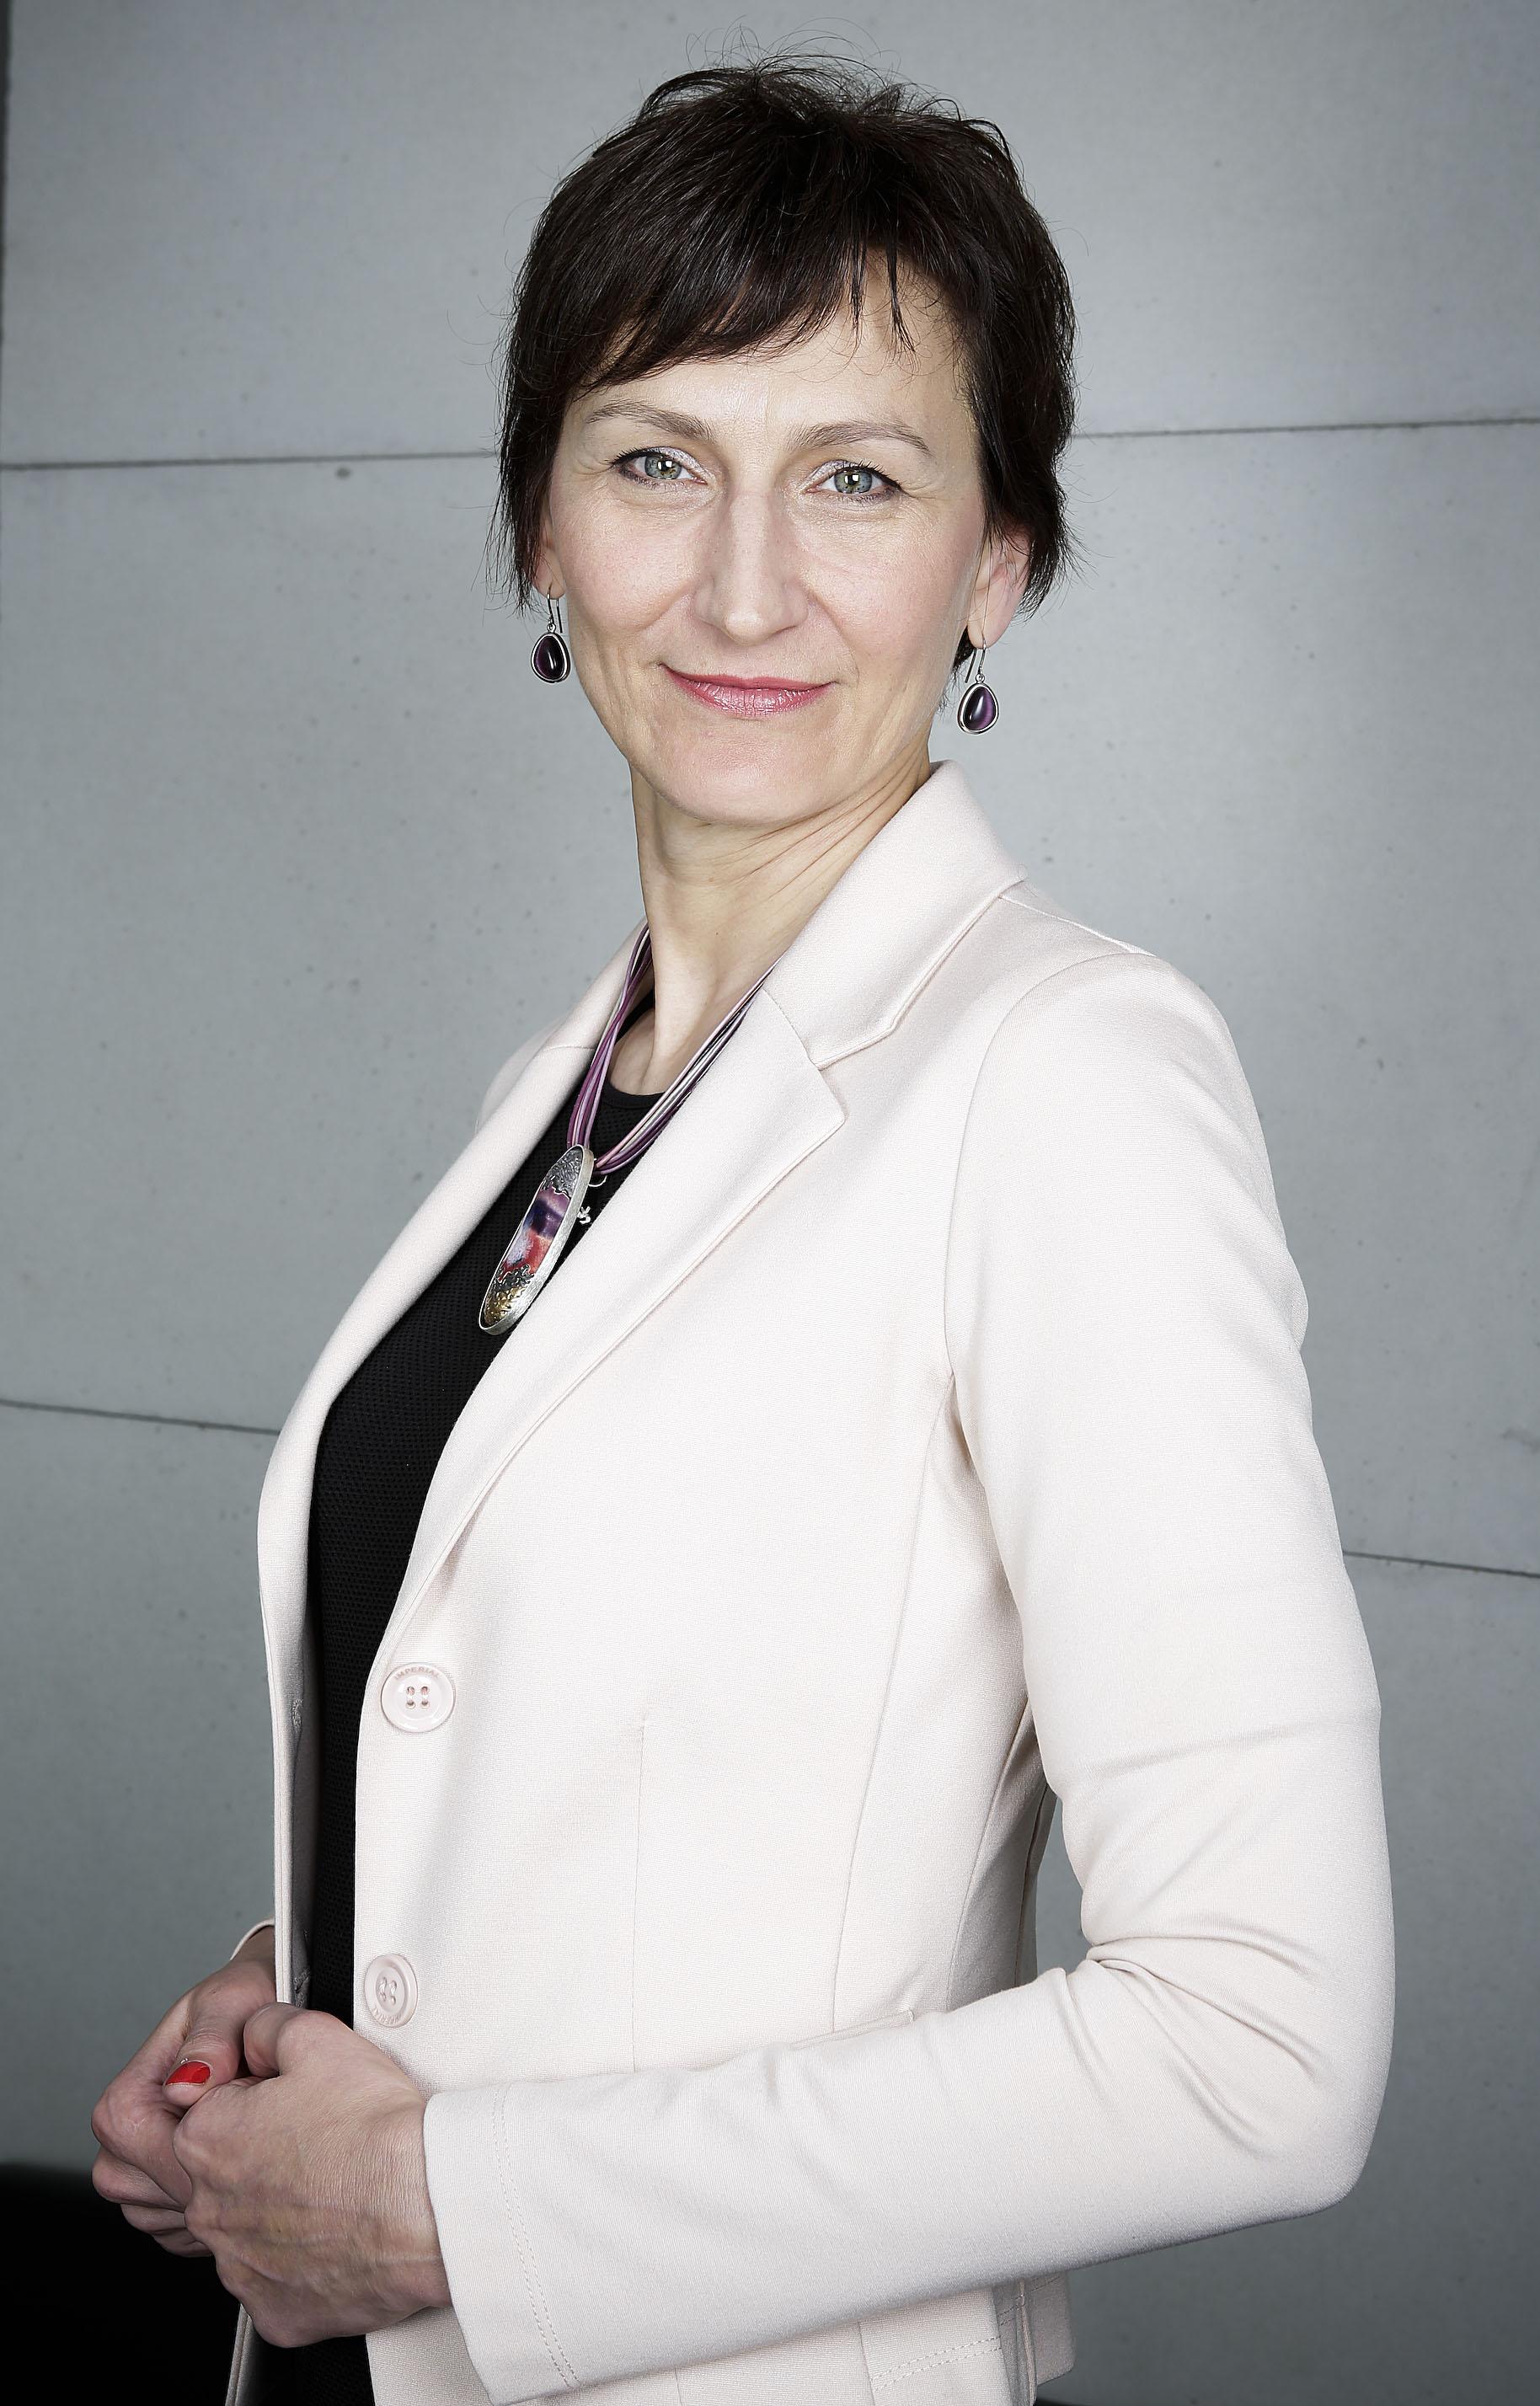 konferencje - rising stars - Jadwiga Sztabińska